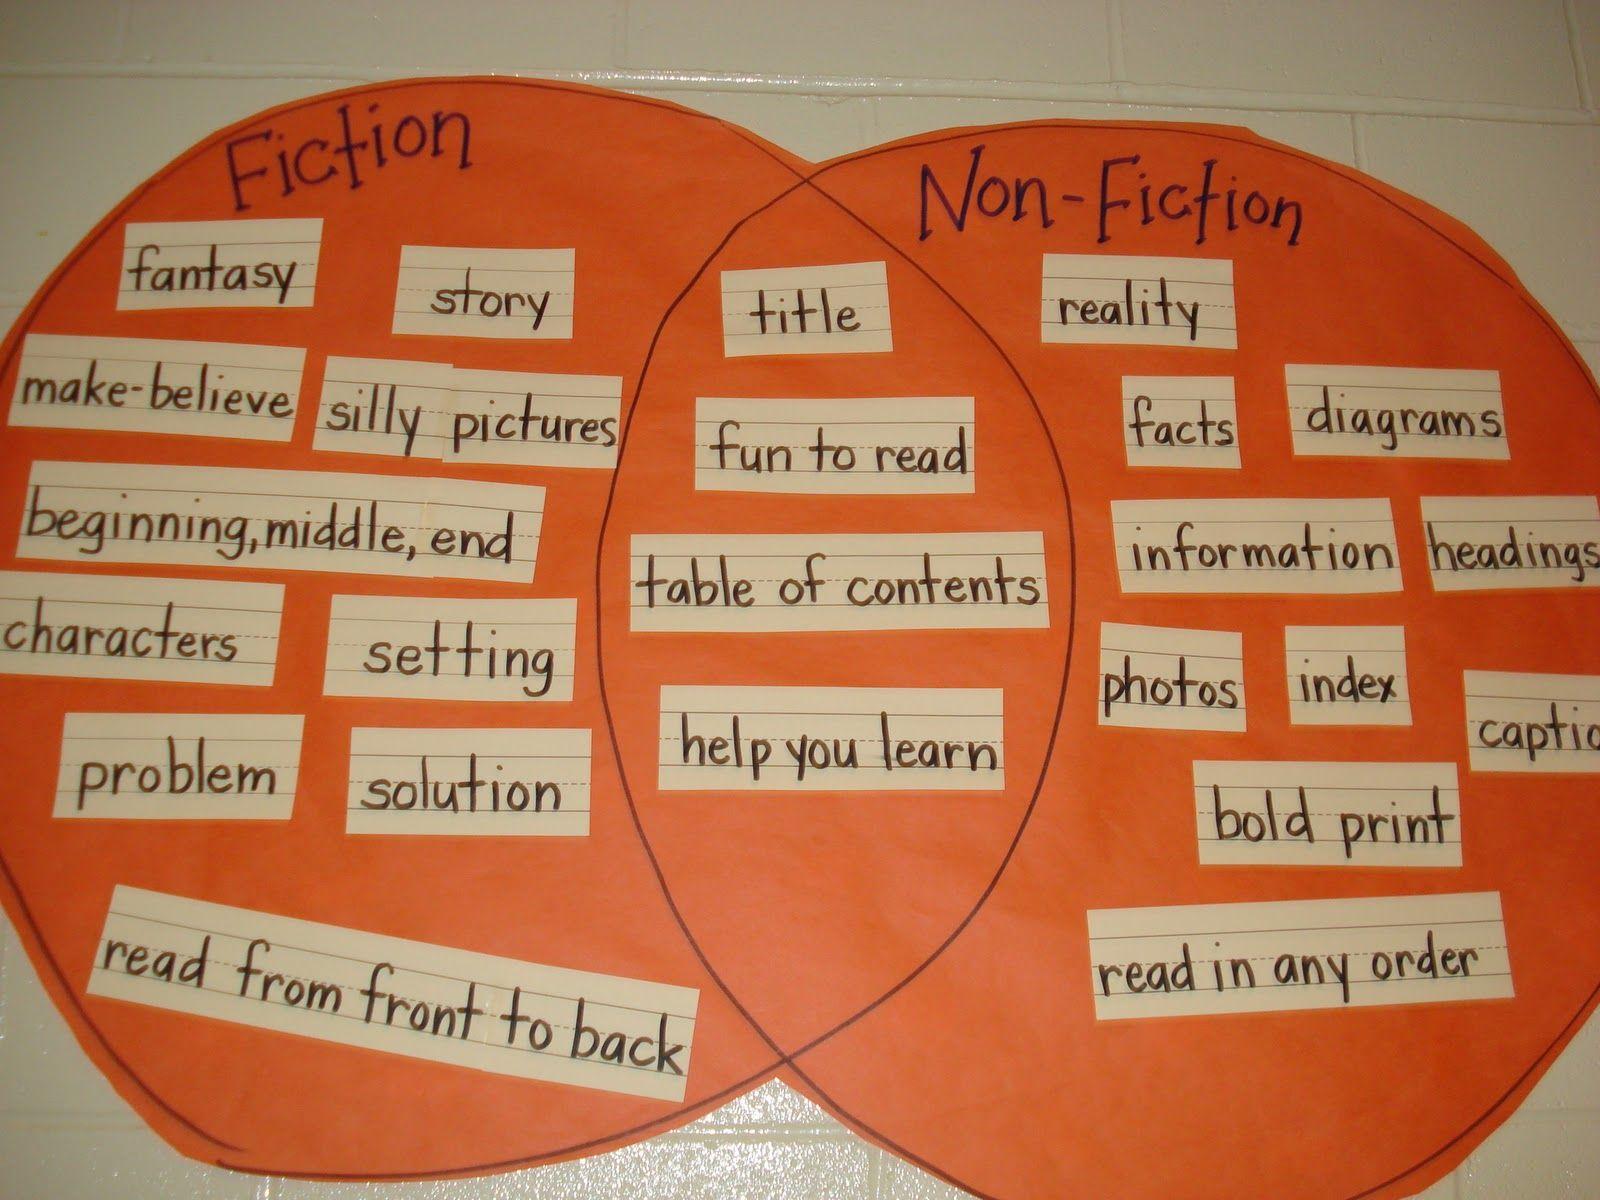 Fictionnonfiction venn diagram cool teaching ideas pinterest fictionnonfiction venn diagram teaching readingteaching ideasguided ccuart Image collections